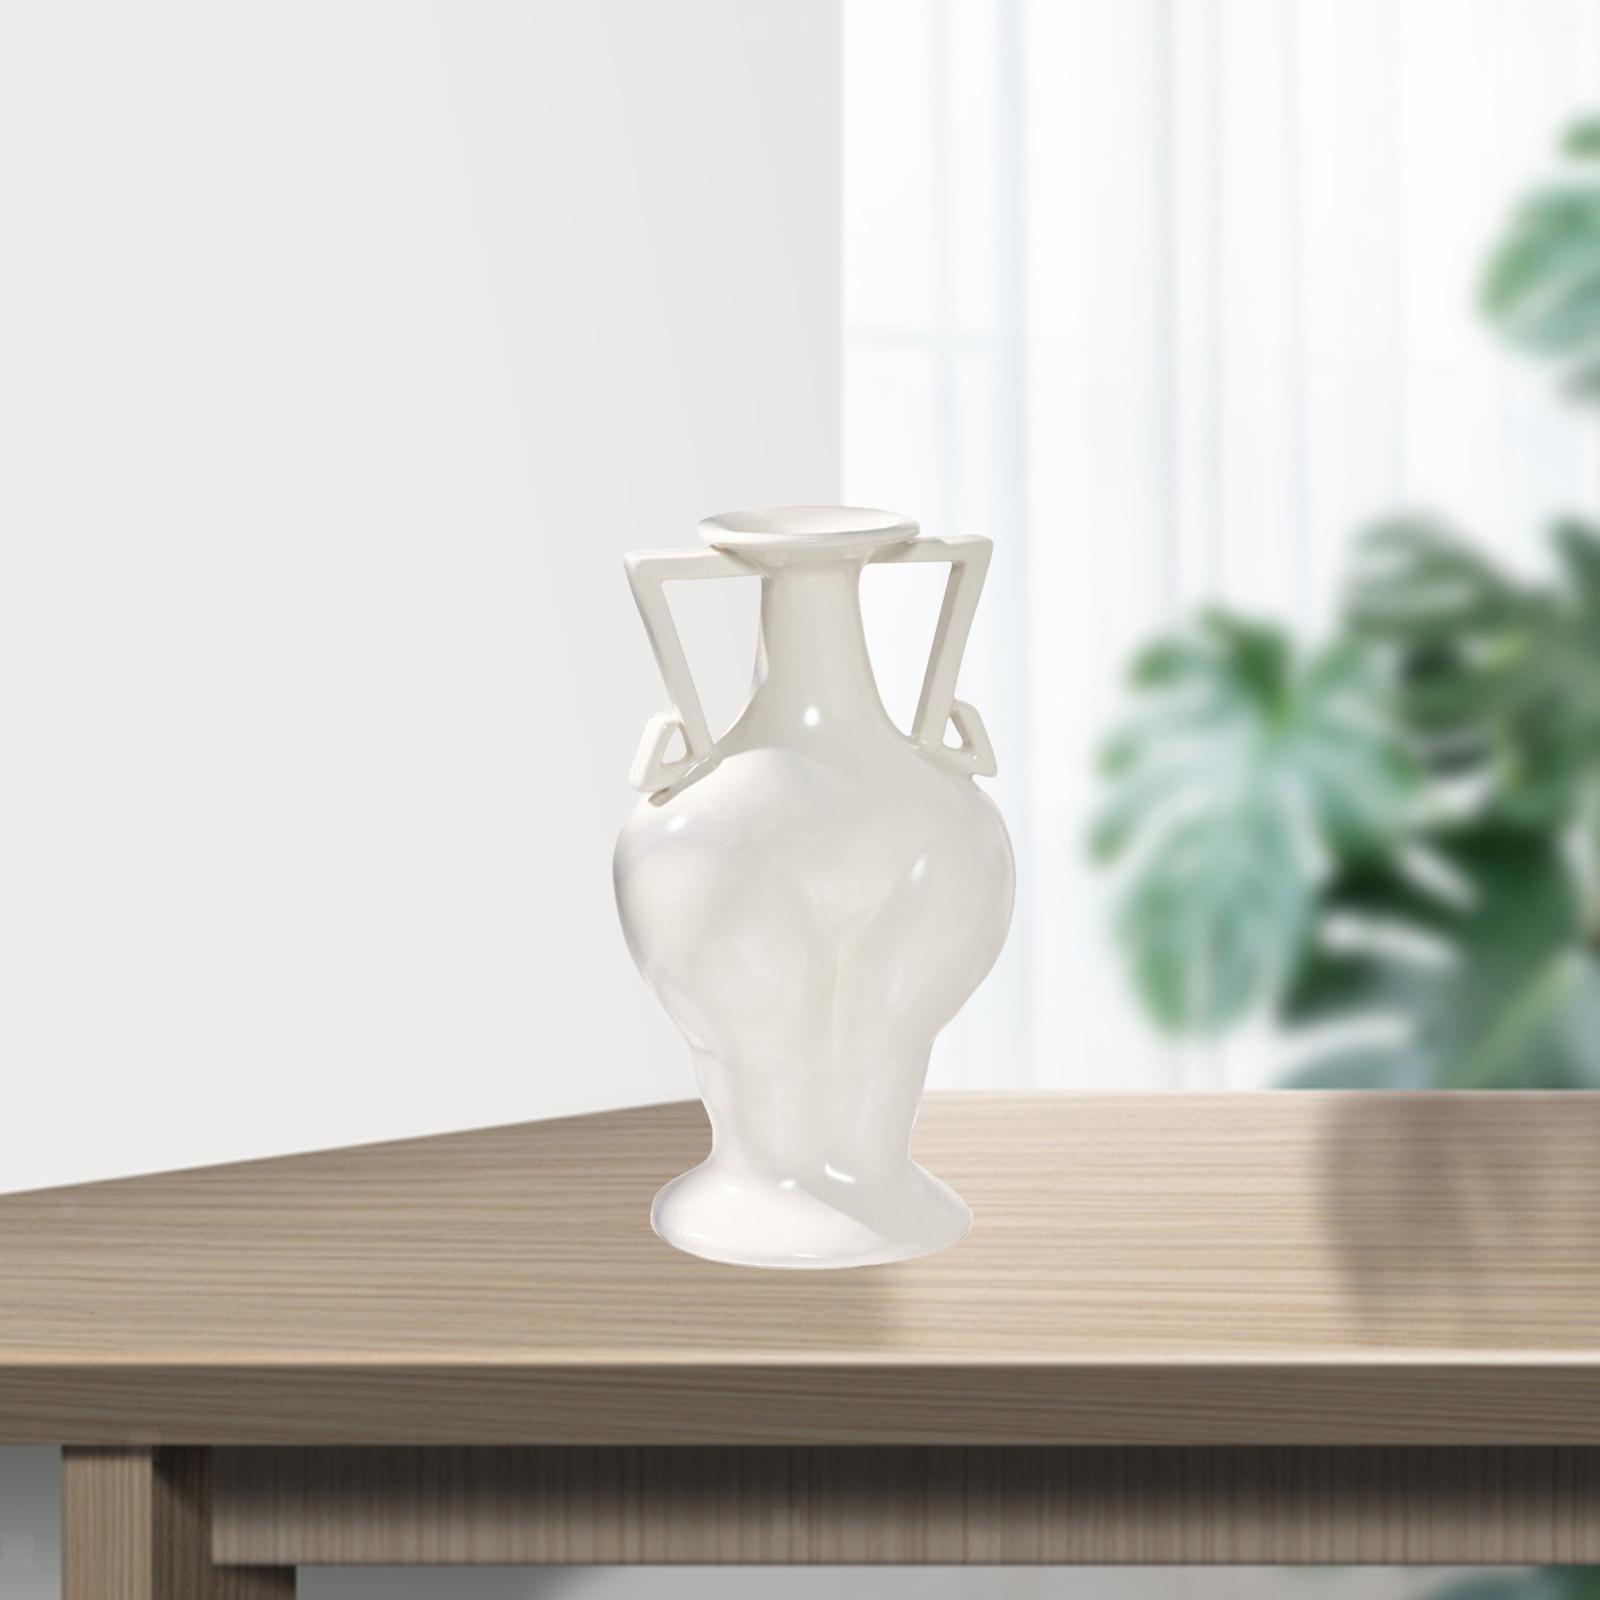 Indexbild 32 - Blumenvase Keramik Blumentöpfe Trockenblumenhalter Pflanzenvasen Wohnkultur